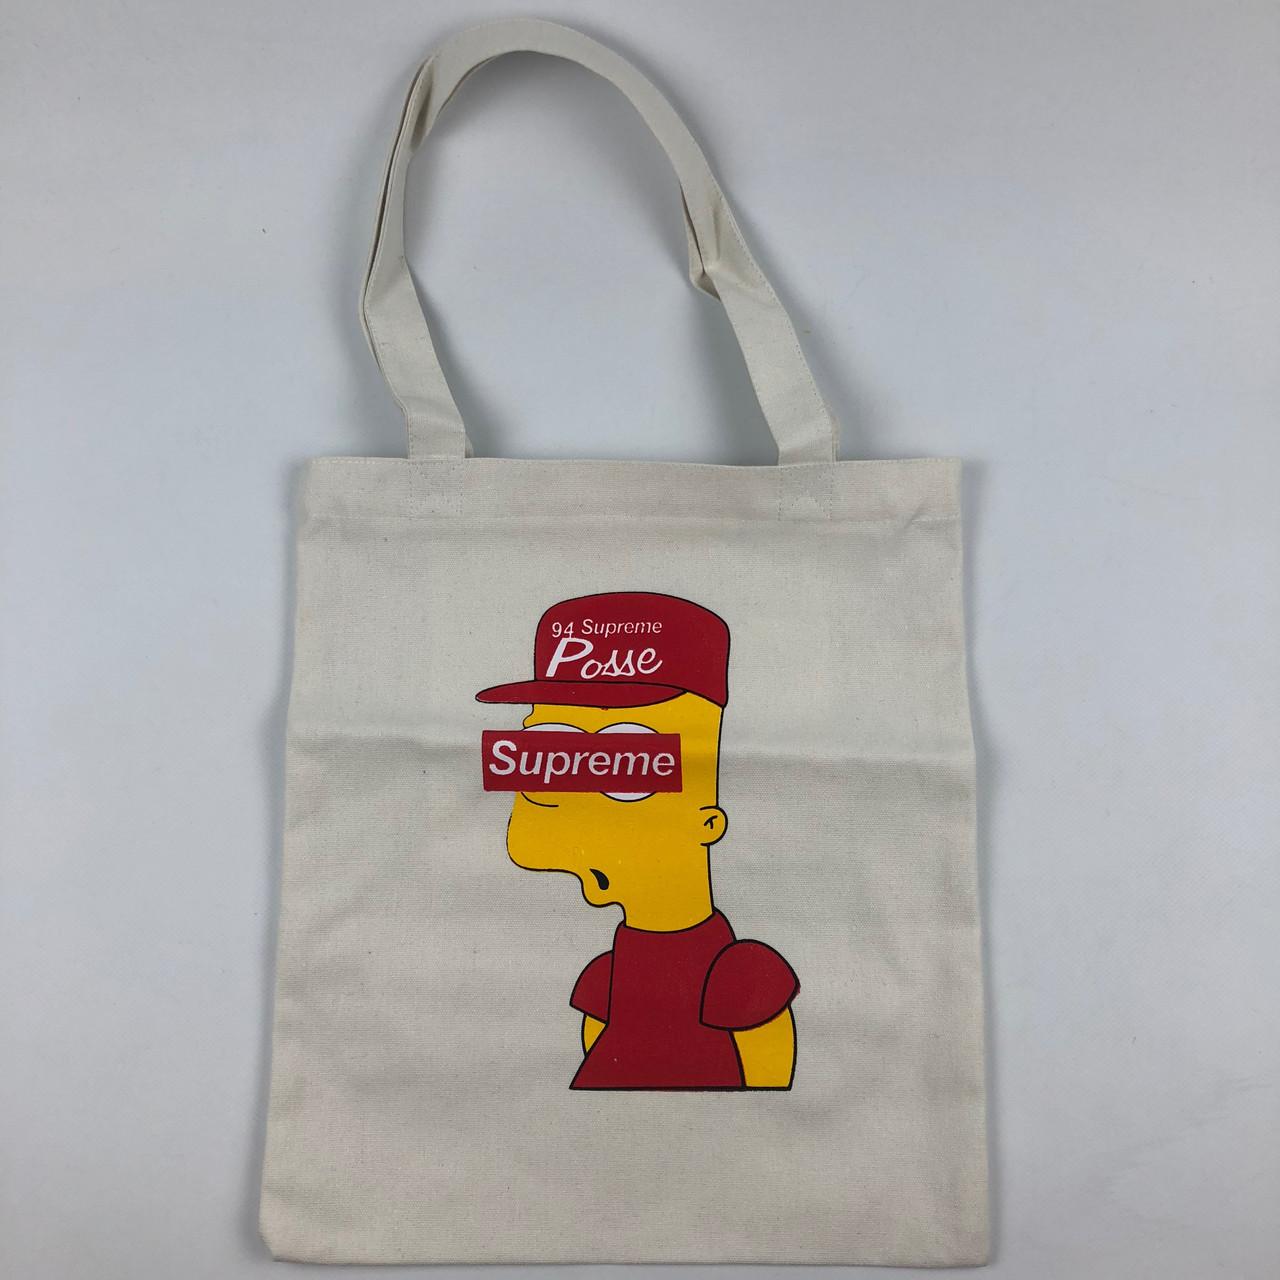 Тканевая Эко Сумка Шоппер Supreme Simpson Симпсон Bart Барт Белая